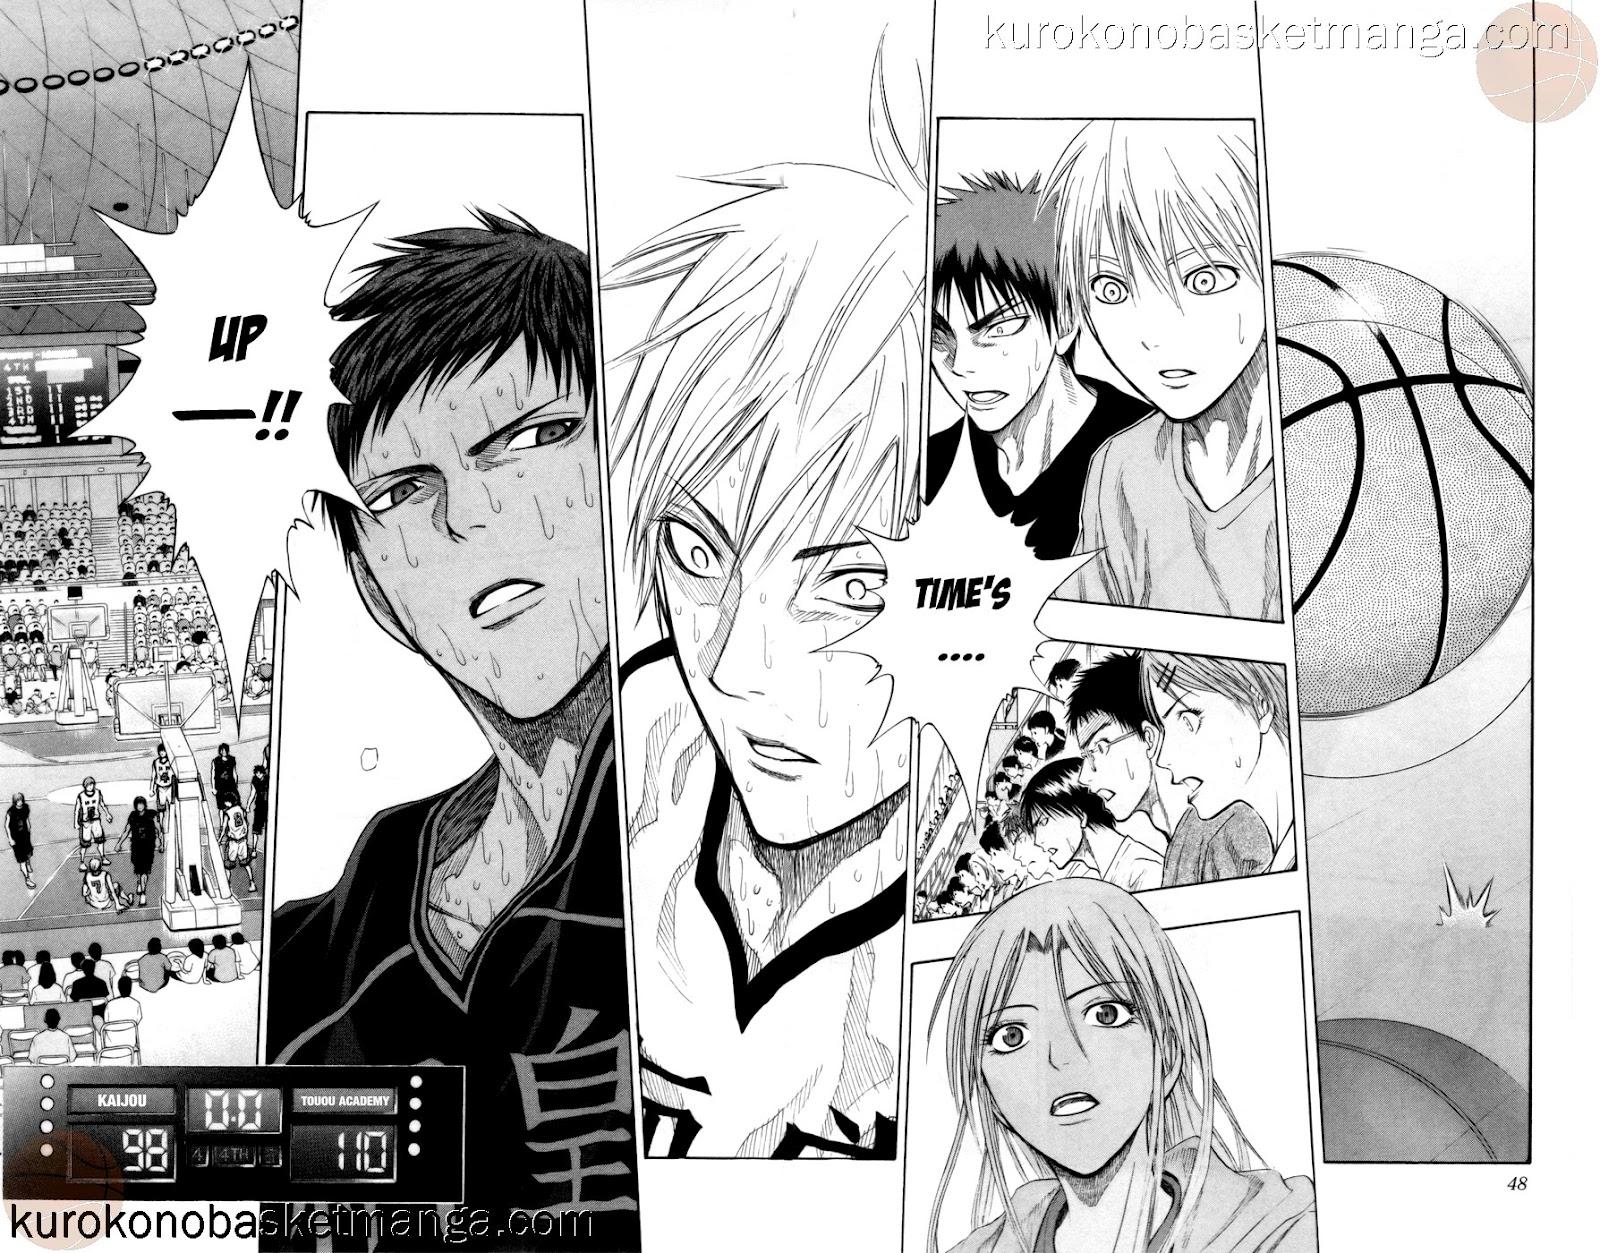 Kuroko no Basket Manga Chapter 73 - Image 02-03